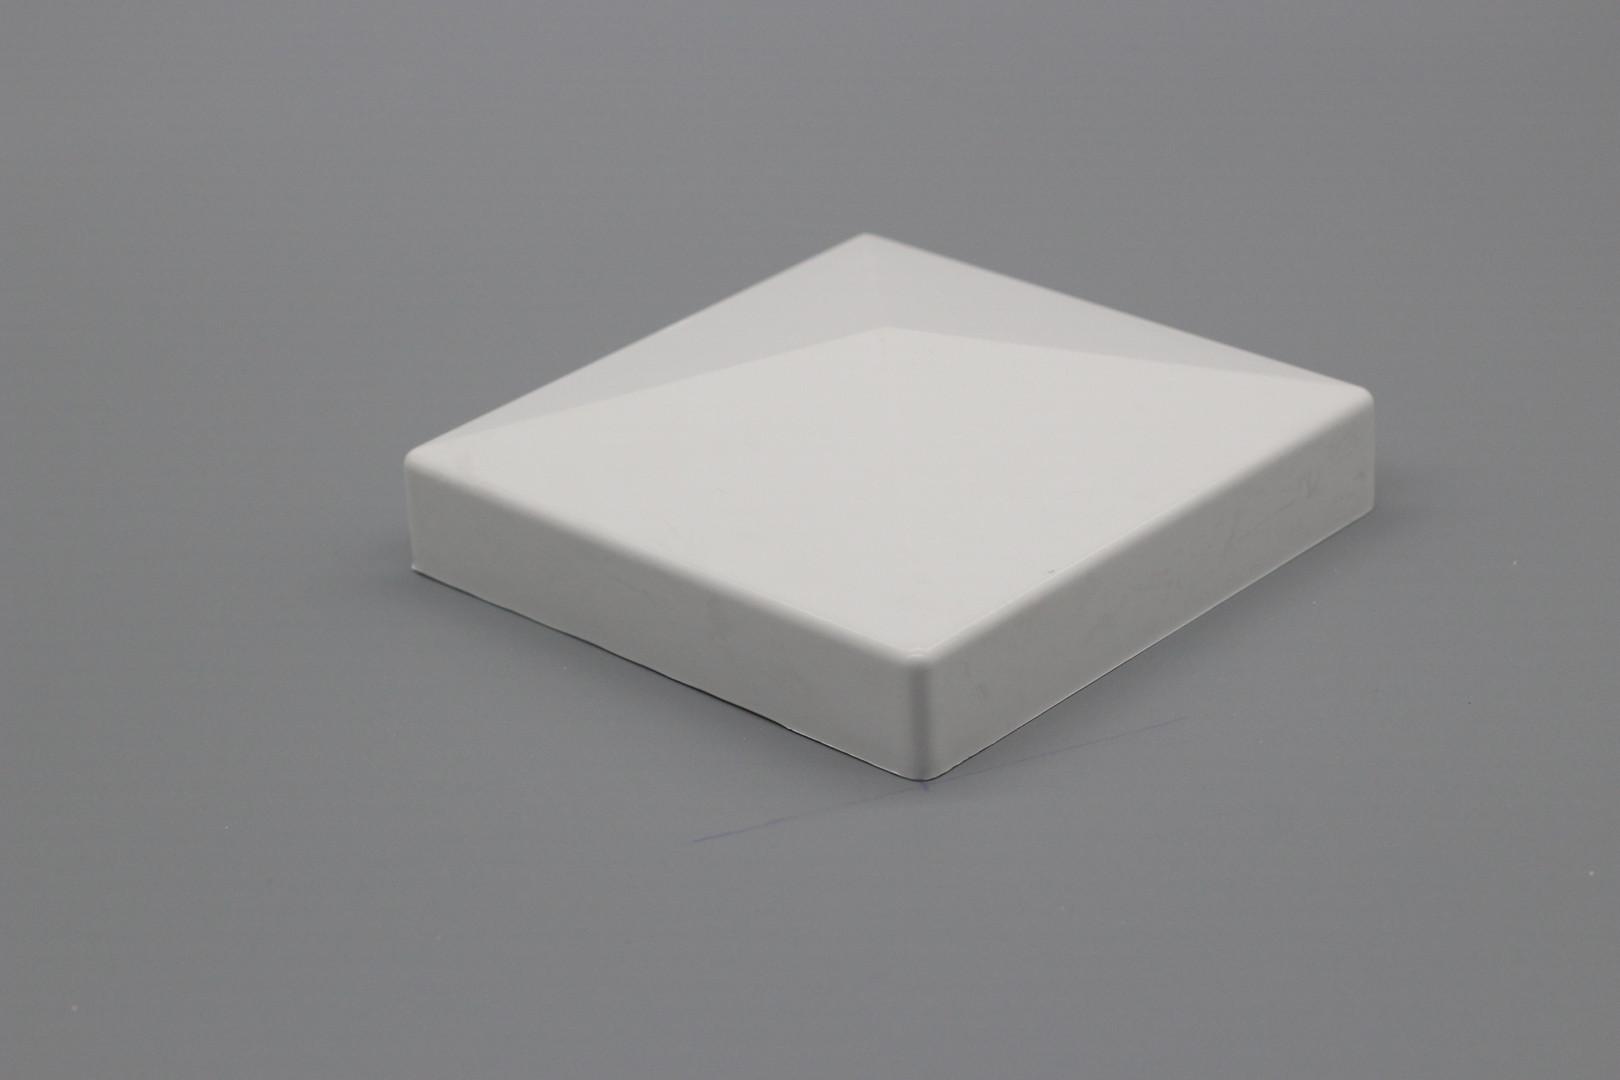 Standard Flat Cap